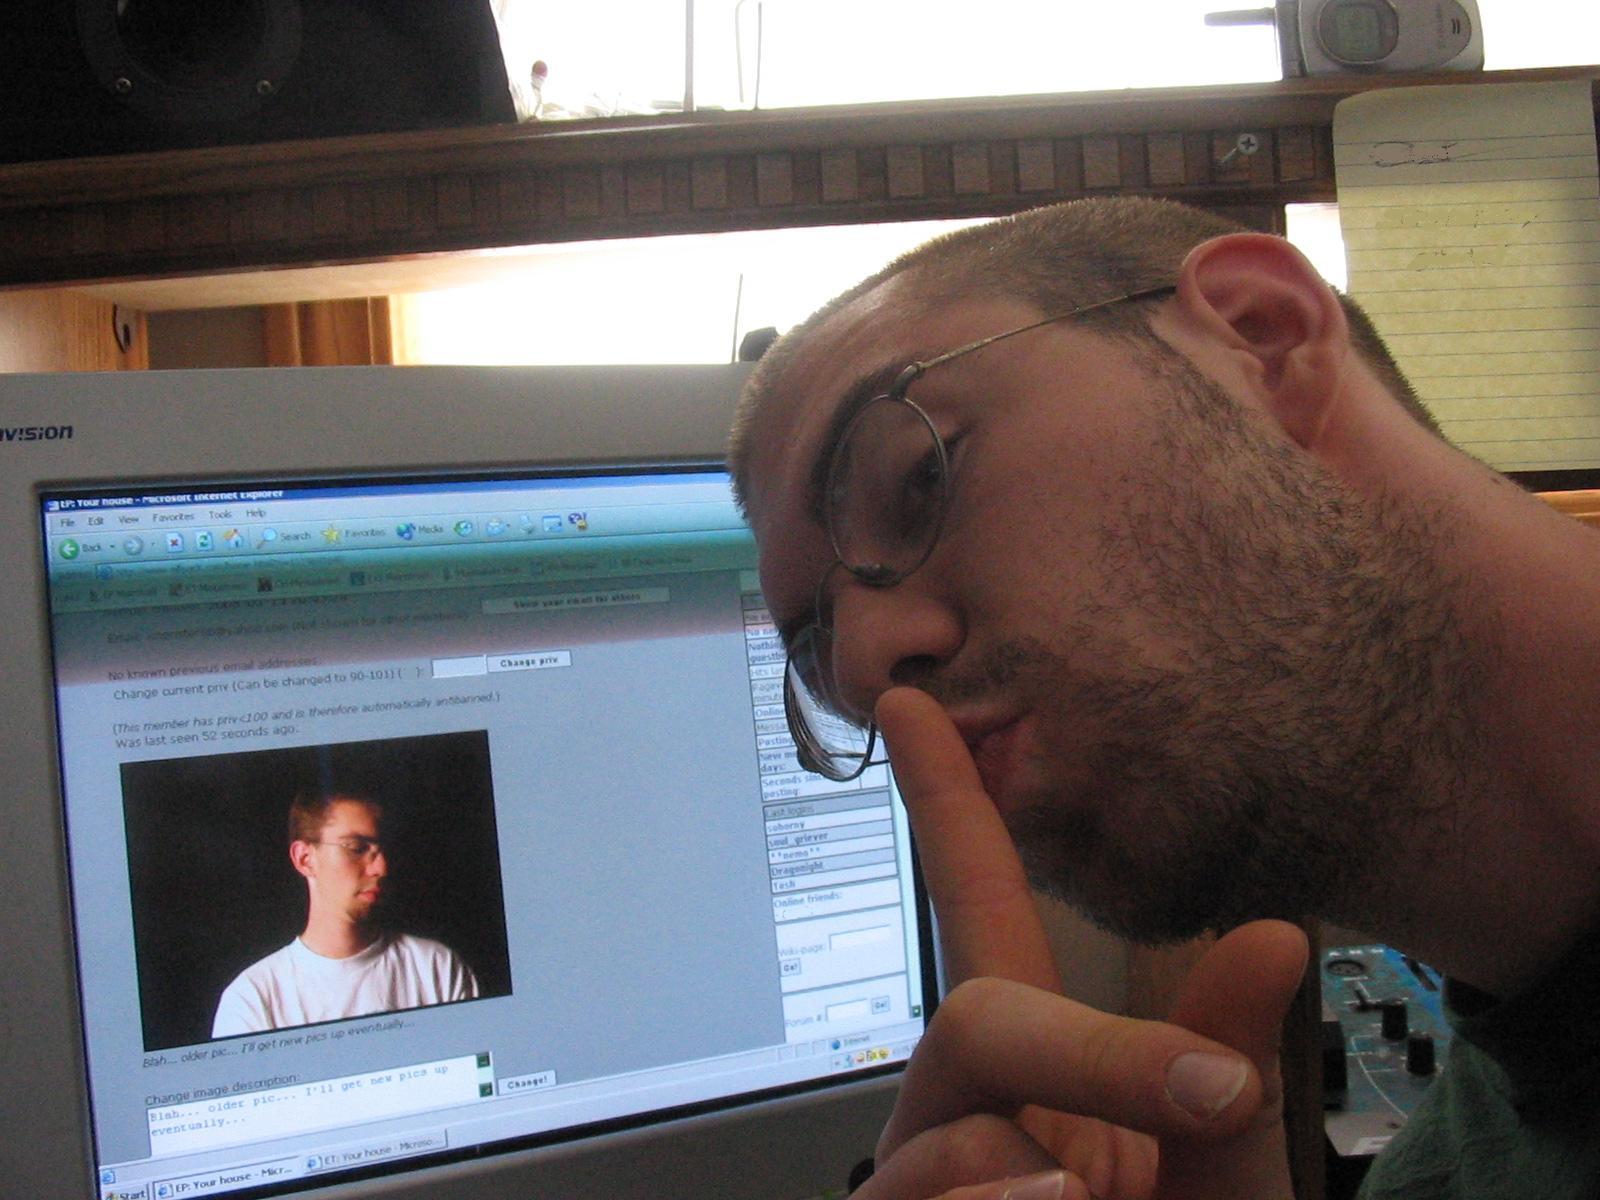 <img20*20:http://www.elfpack.com/stuff/xmons_gee01>